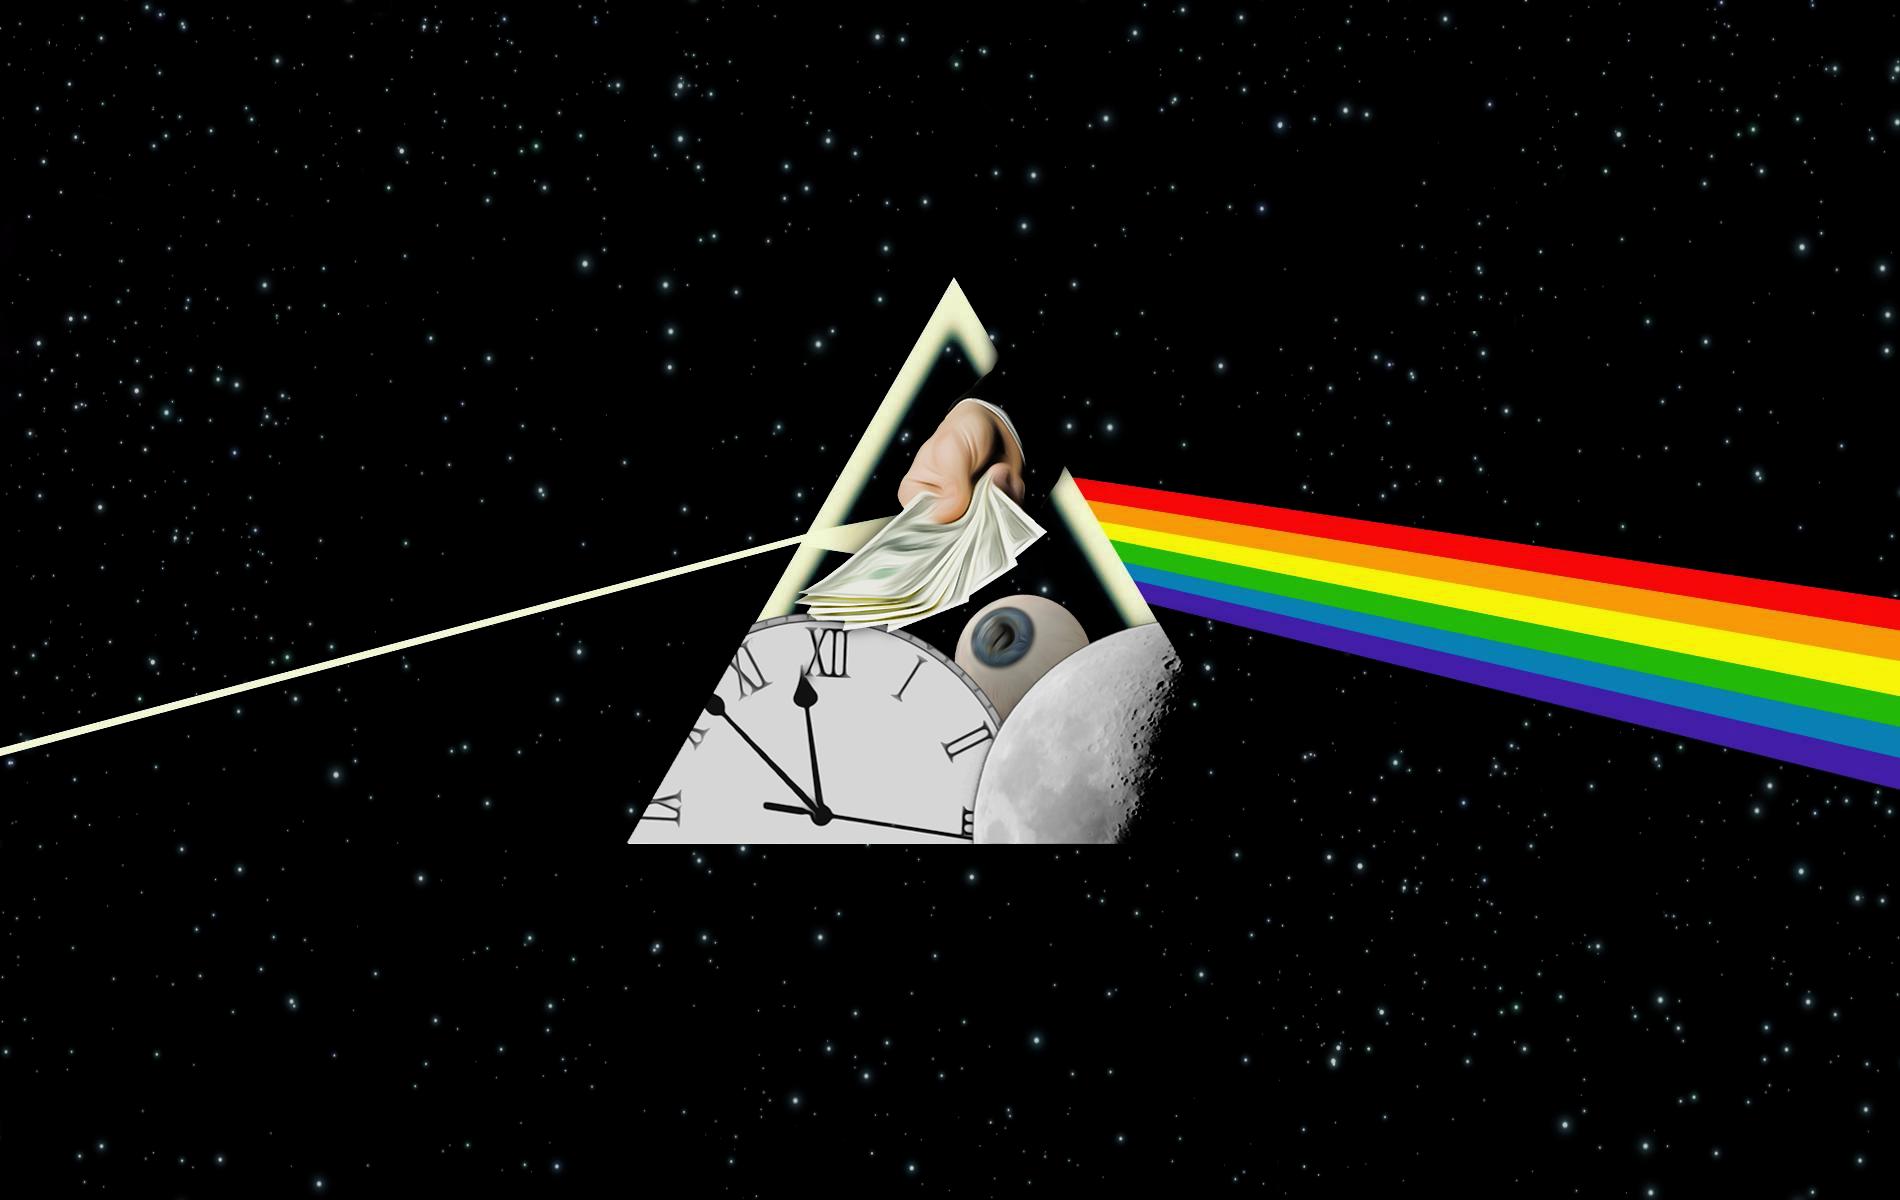 Download Dark Side Of The Moon Wallpaper Gallery